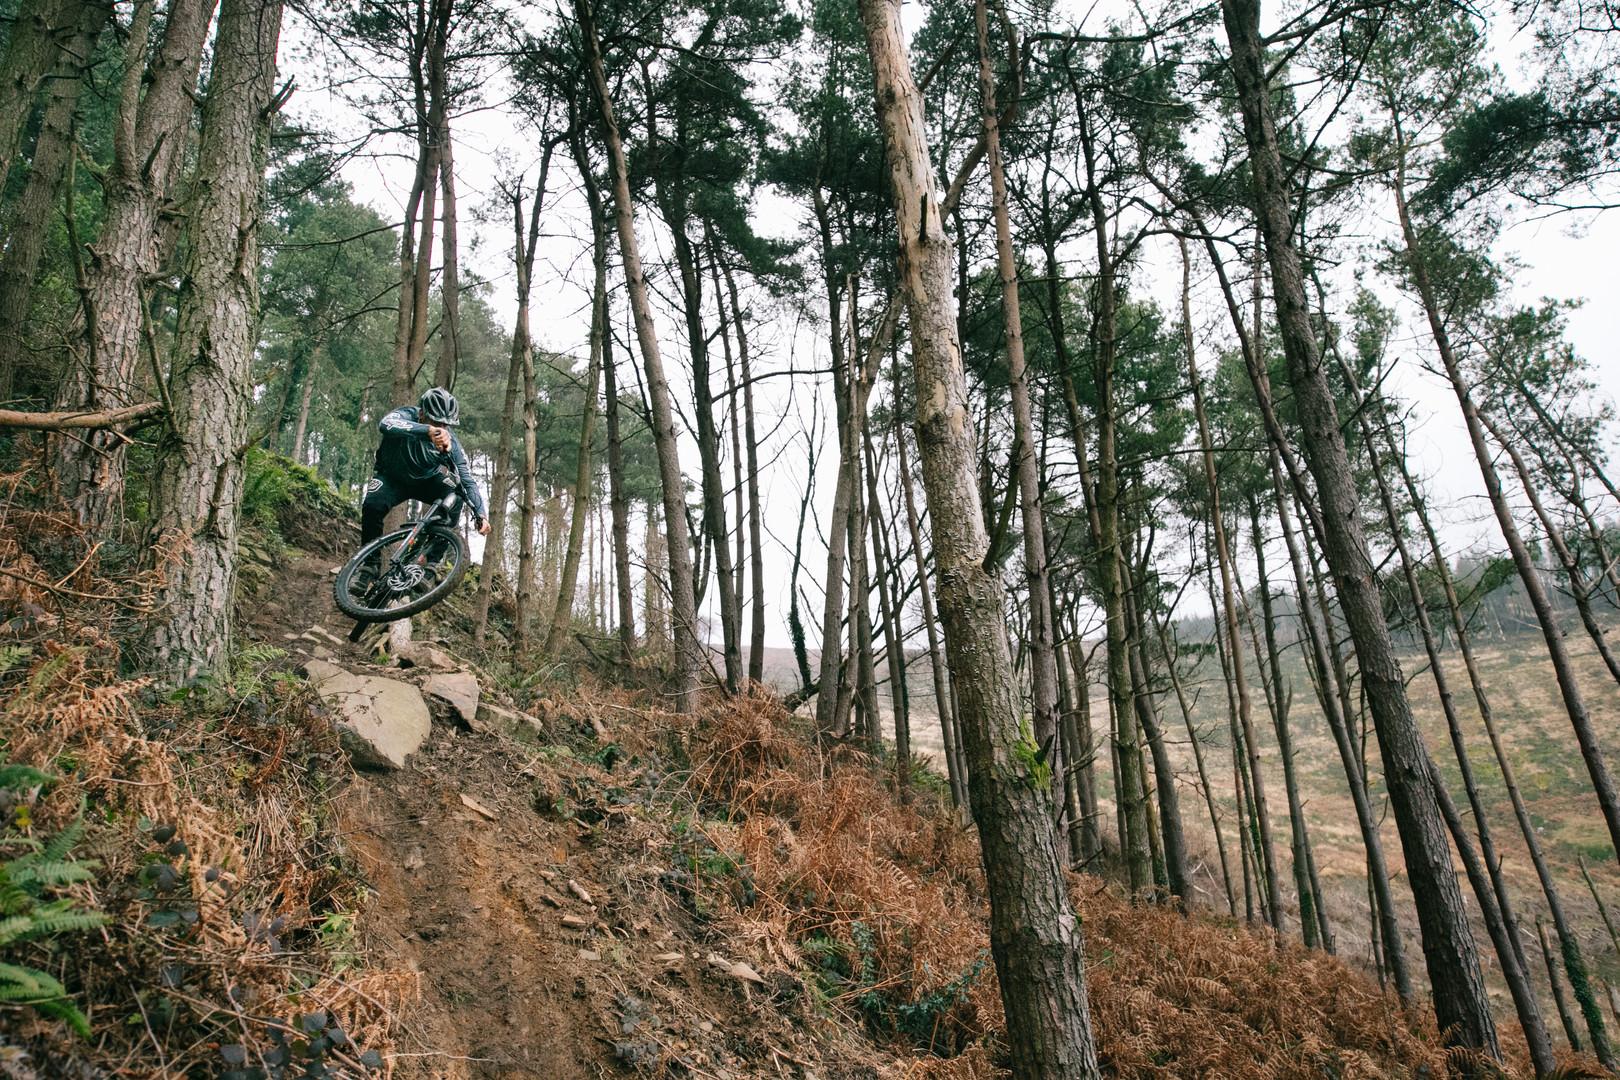 Ajay Jones at Risca